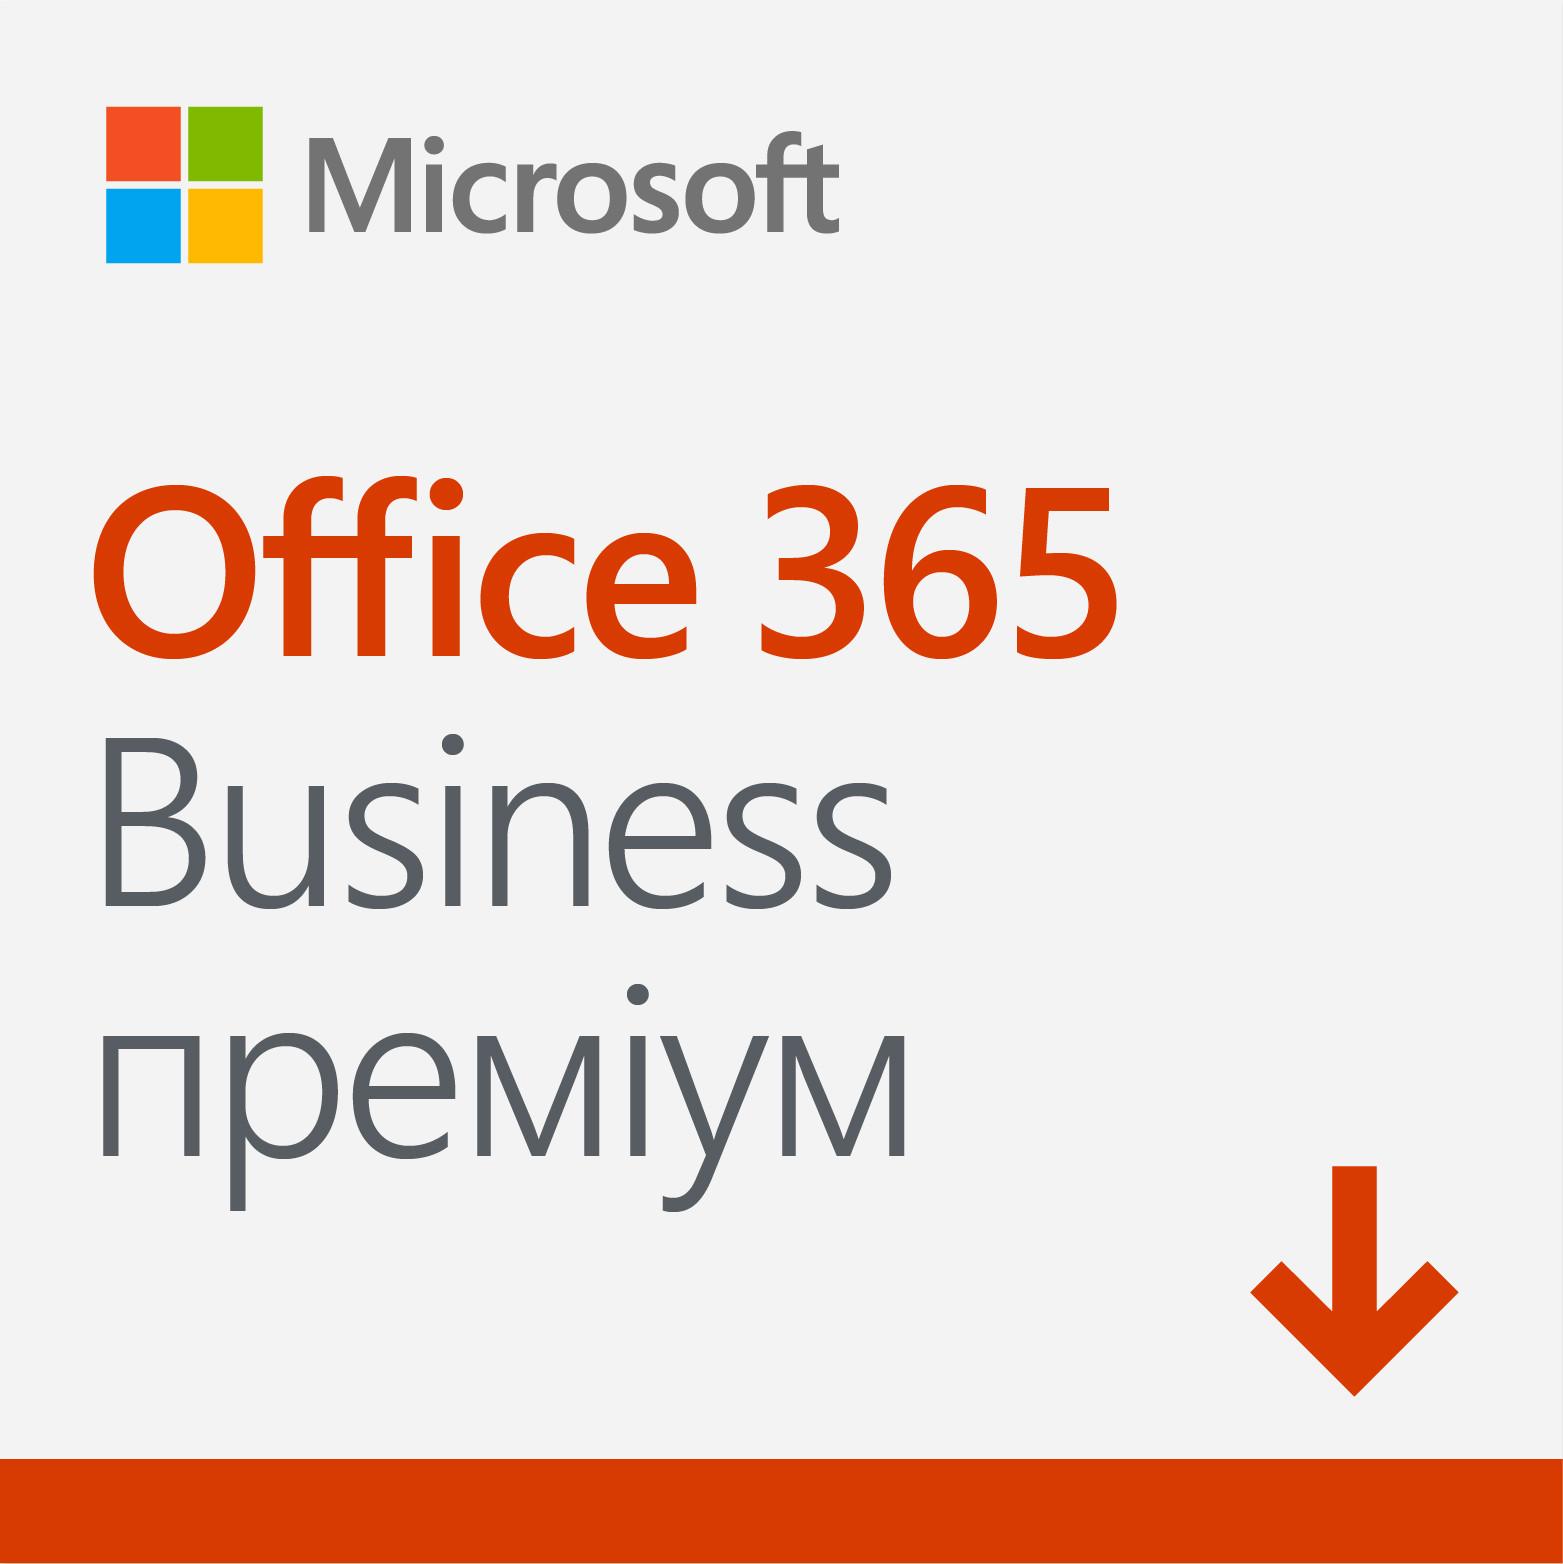 Office 365 Business премиум